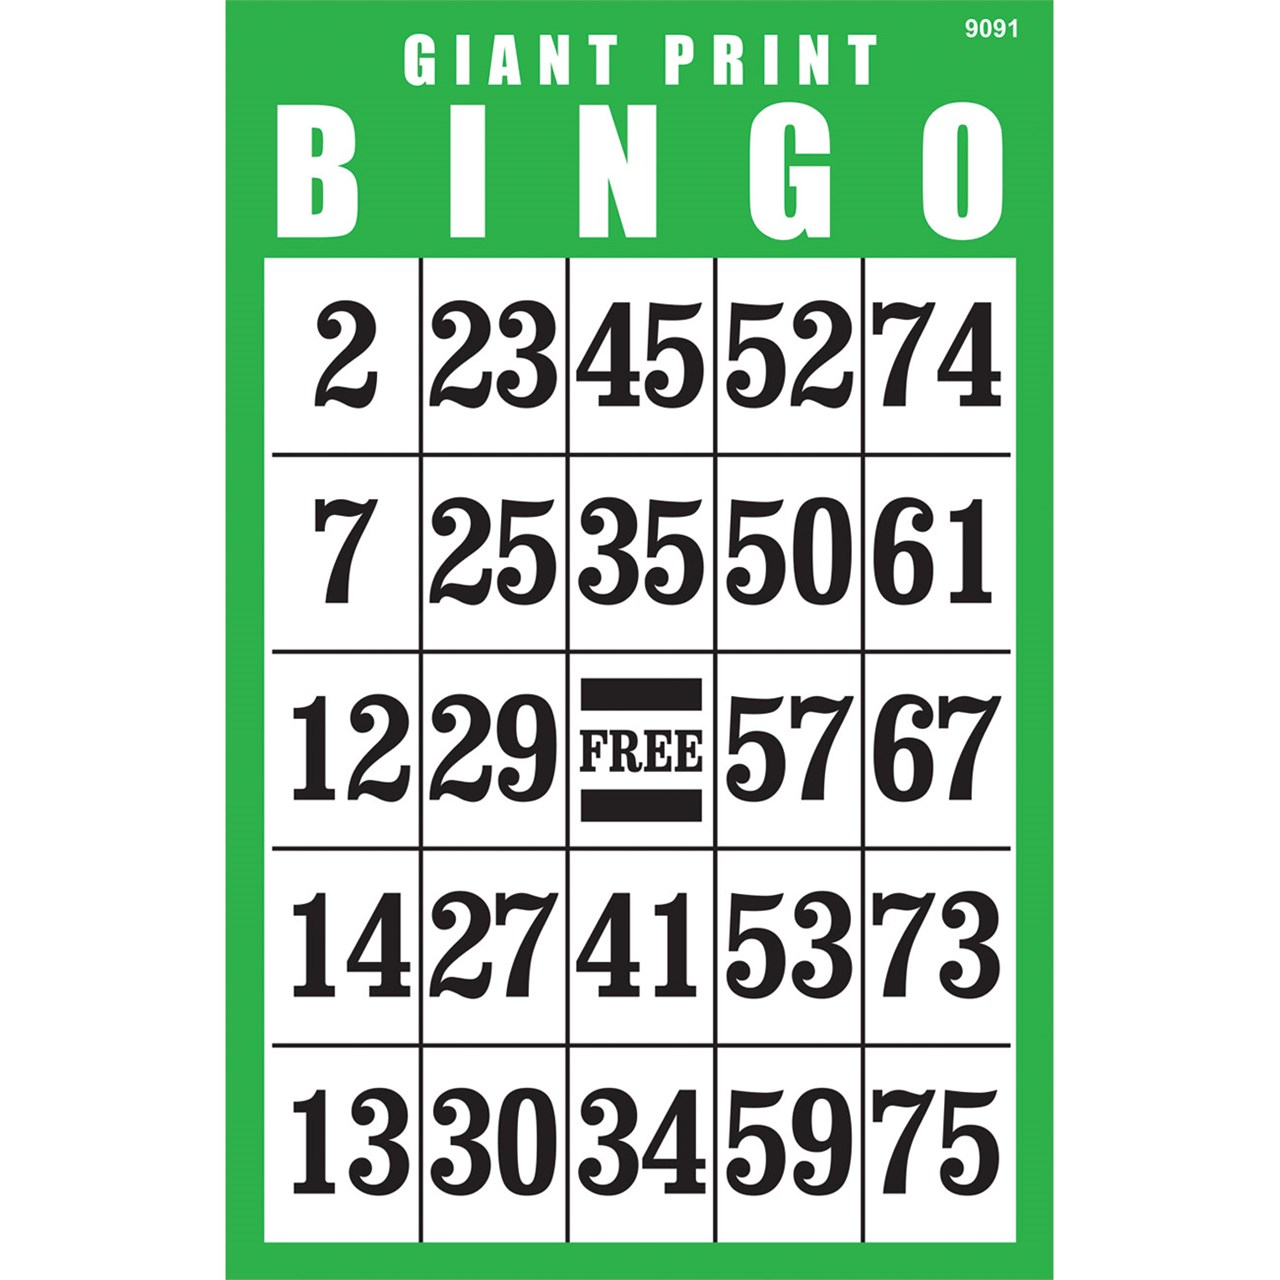 Giant Print BINGO Card Green